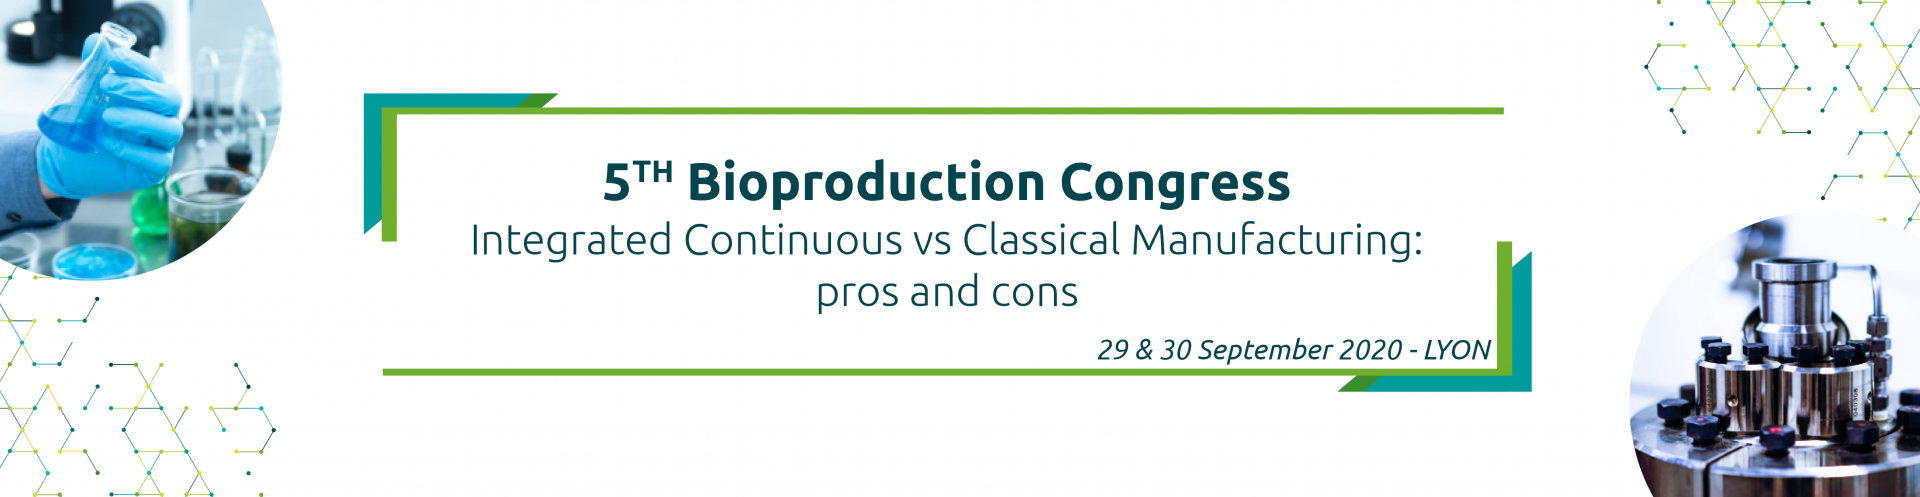 biotech info partenaires bioprod x p